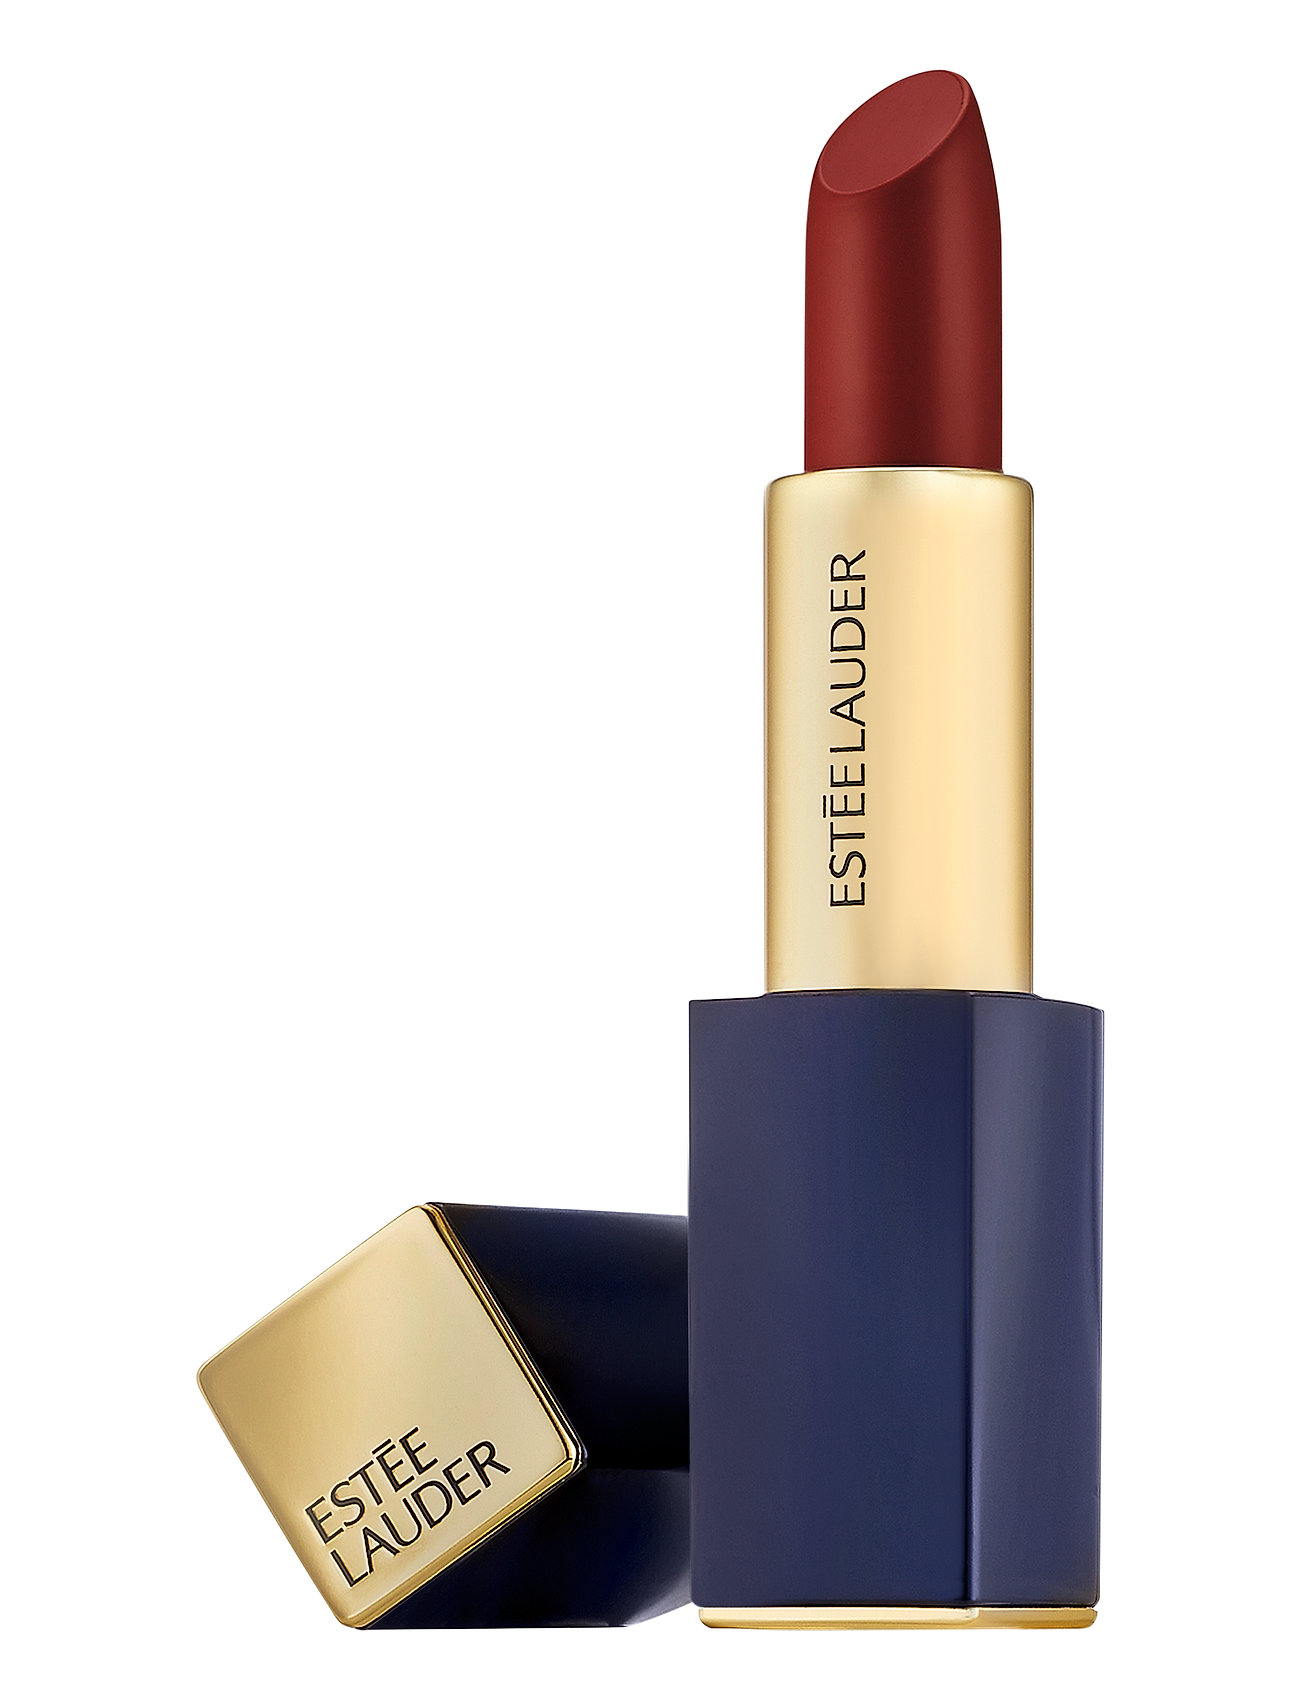 Pure Color Envy Sculpting Lipstick EstÈe Lauder  til Damer i